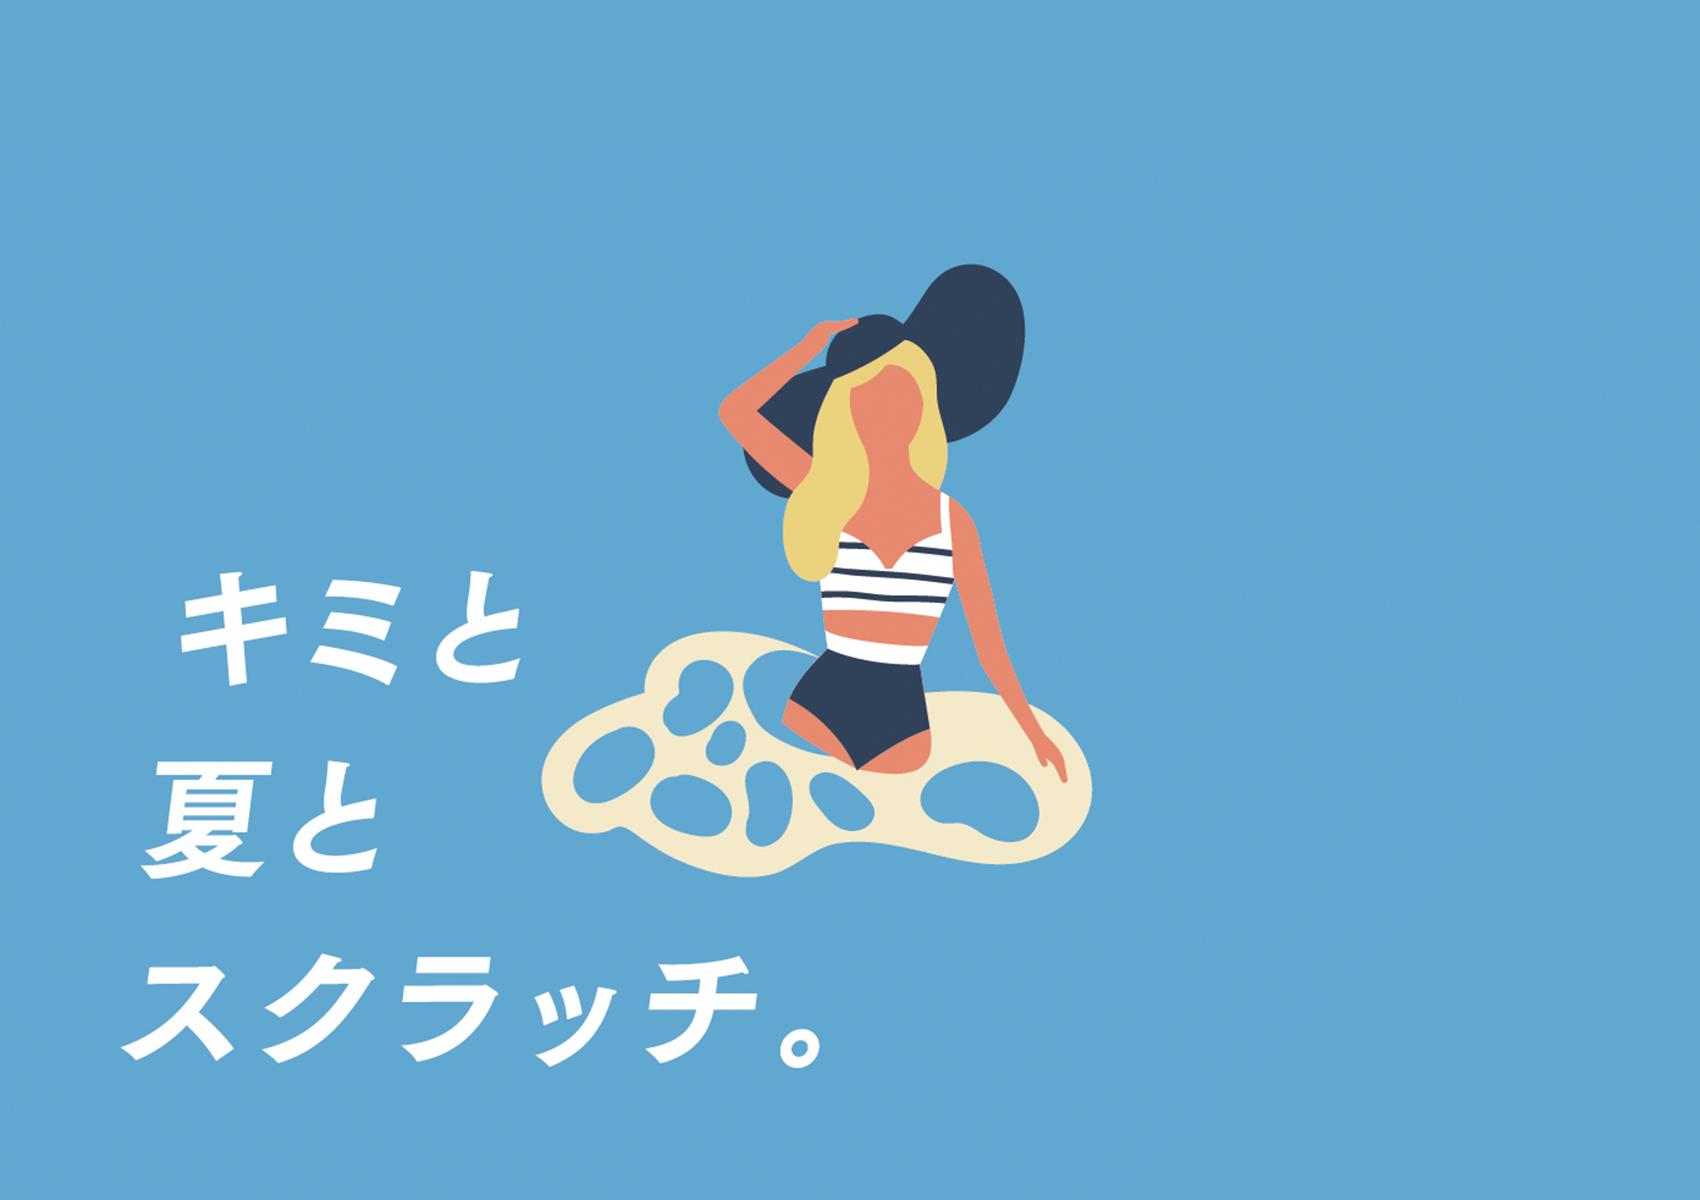 kawagoe sc